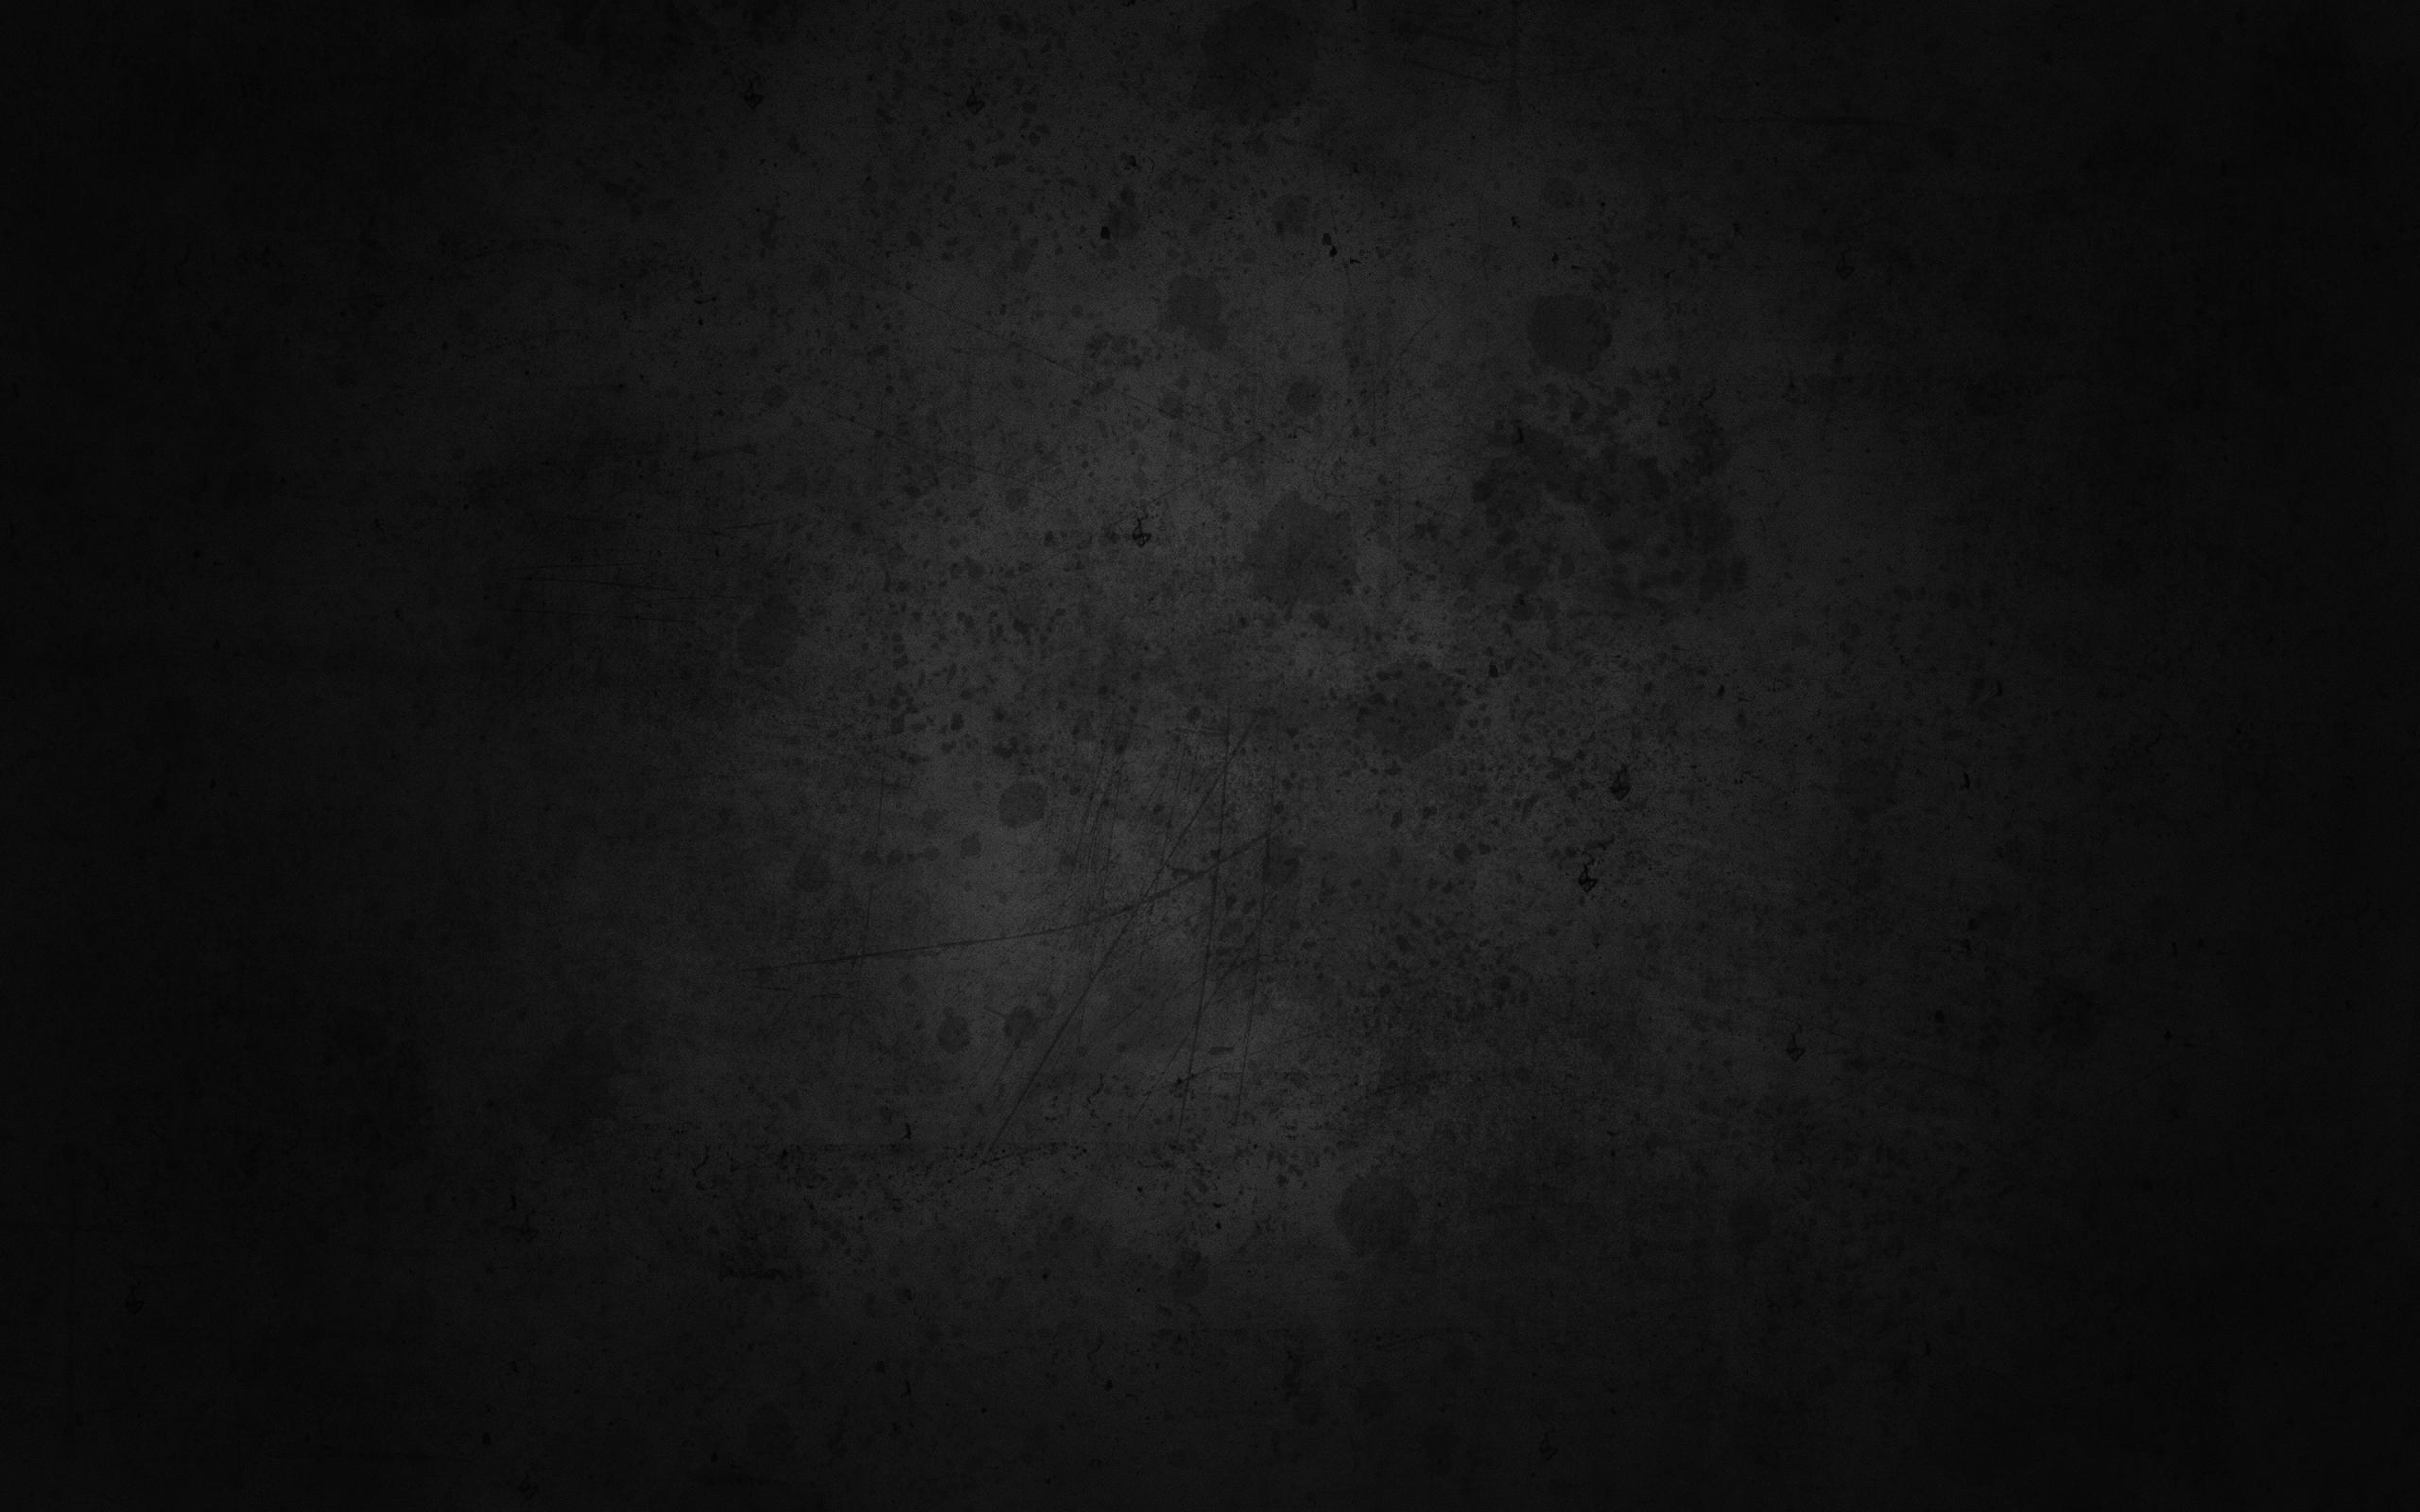 Dark texture background wallpaper 5892 6160 hd wallpapers